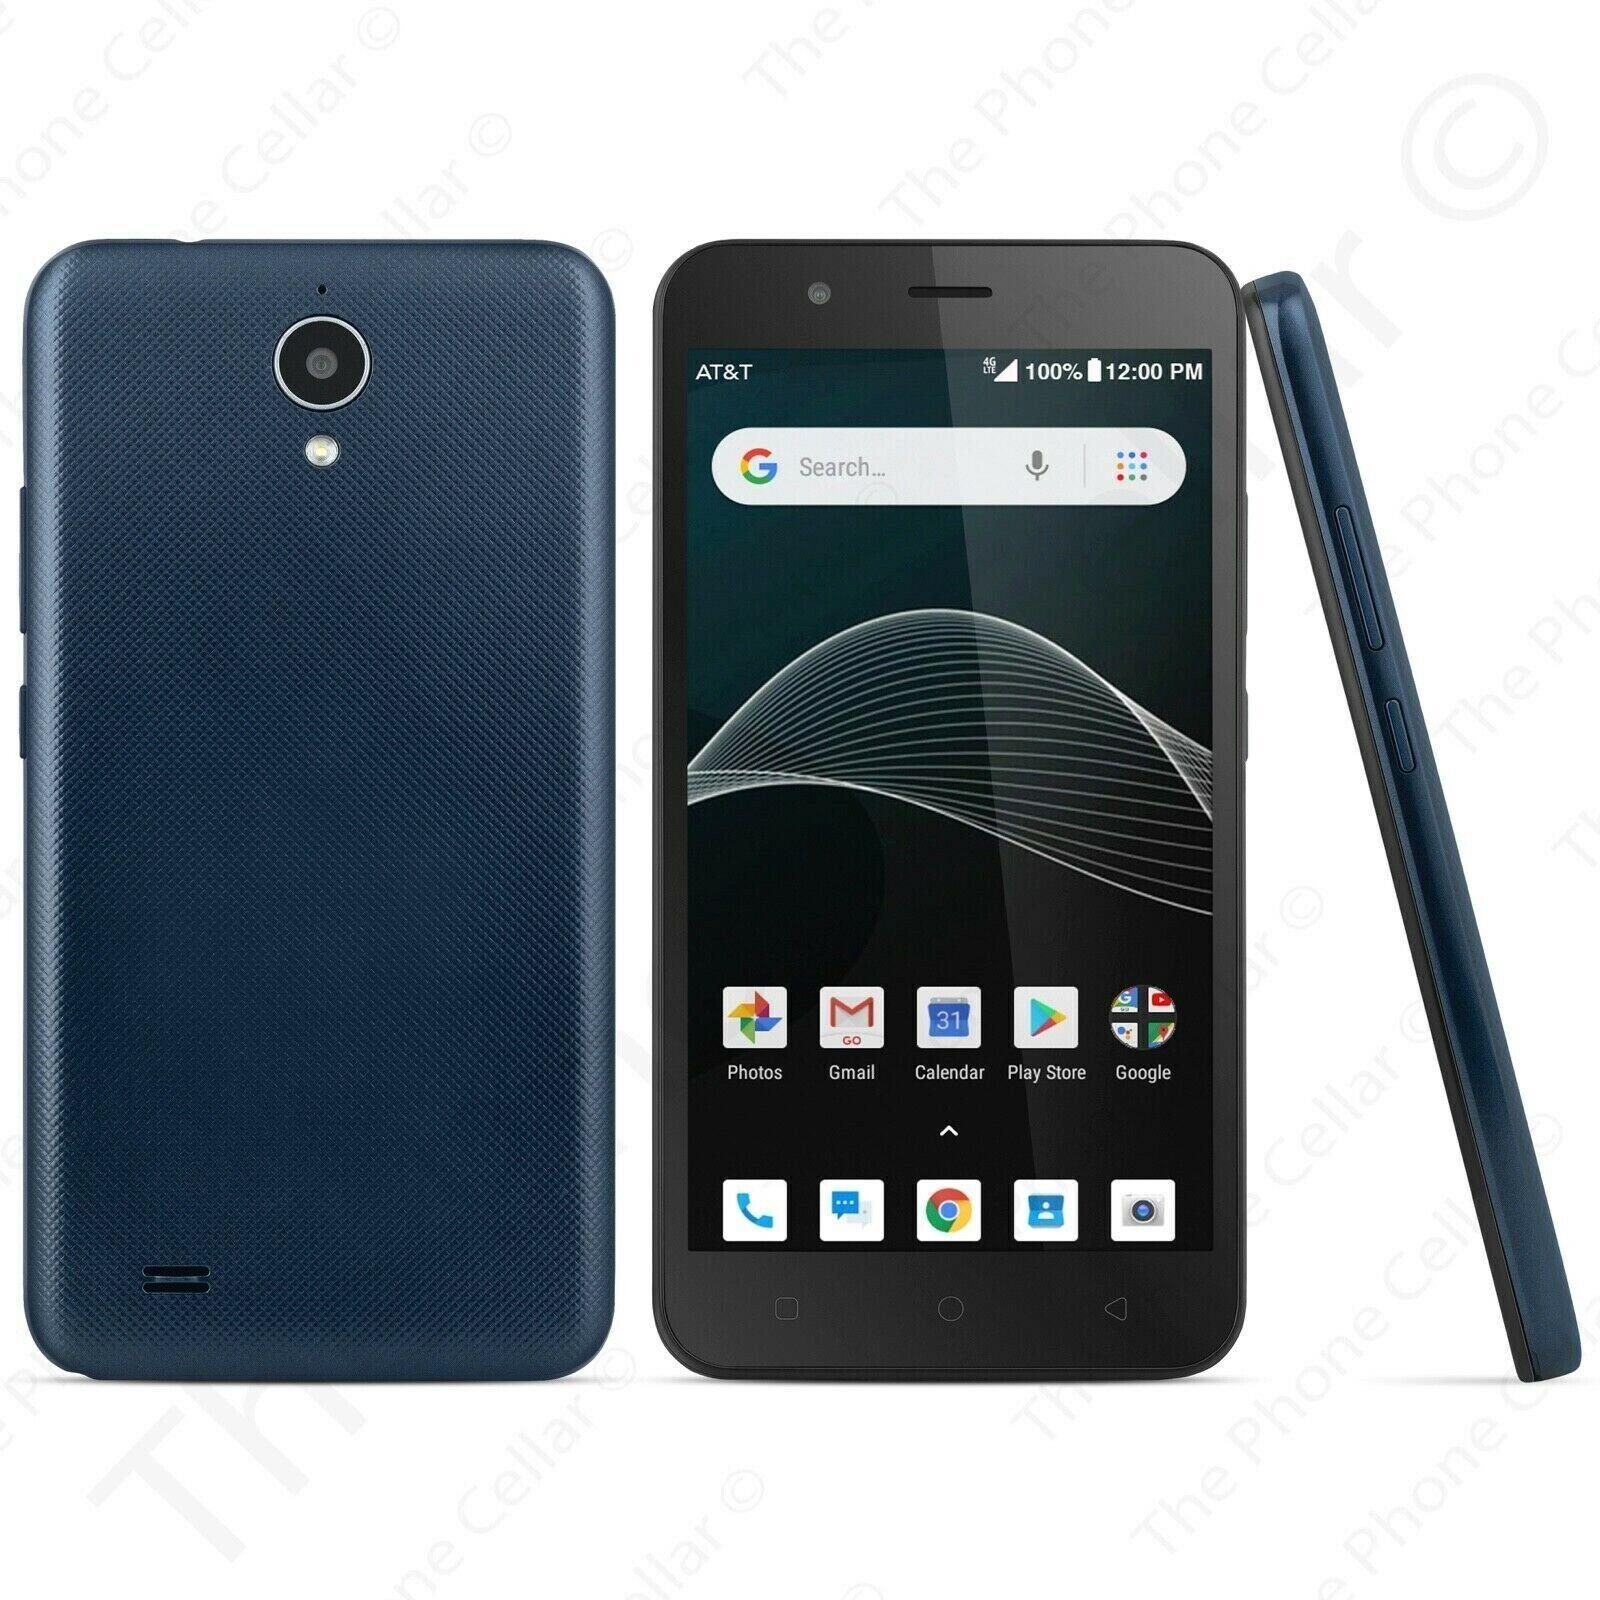 AXIA AT&T Prepaid-With 16GB Memory Prepaid Cell Phone - Dark